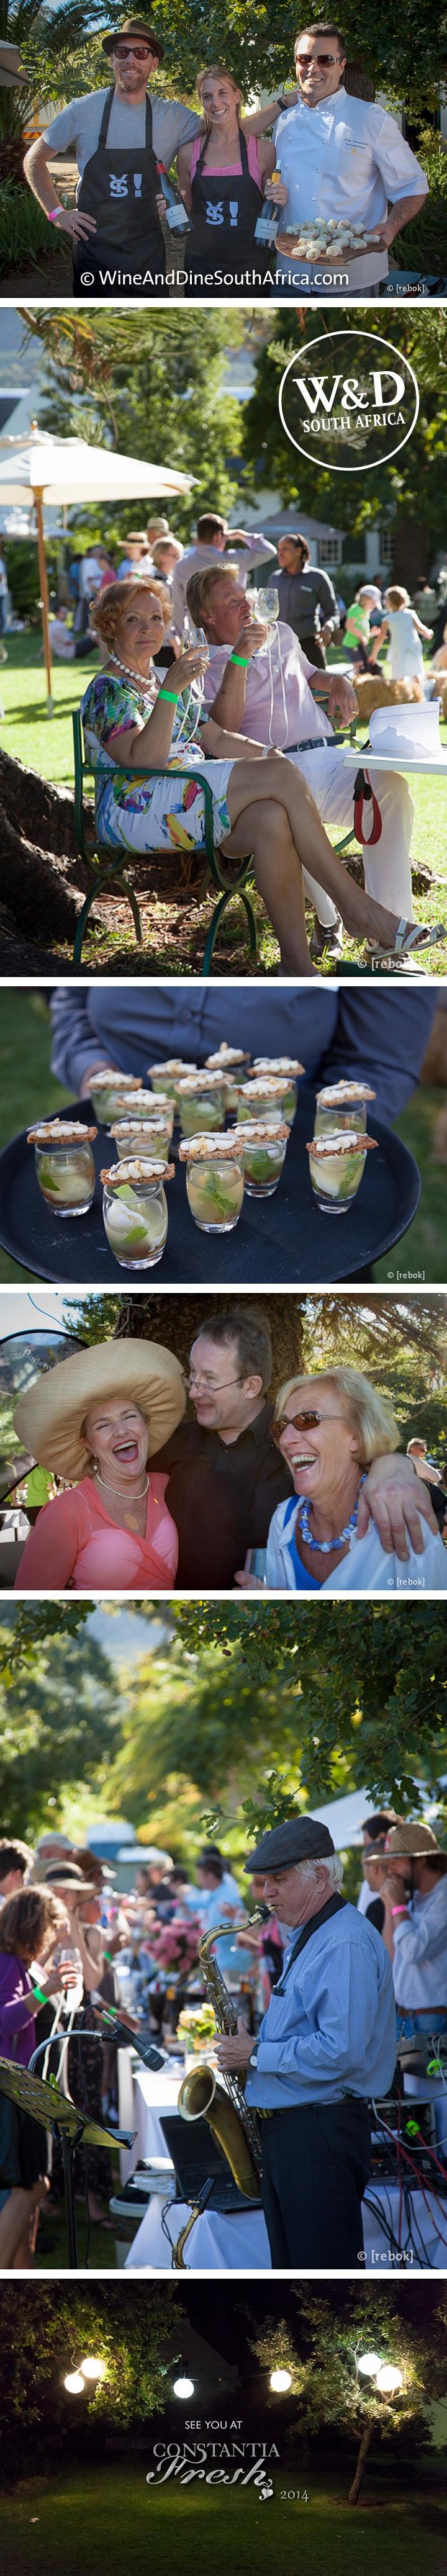 Constantia Fresh Festival 2013 #SouthAfrica #Wine